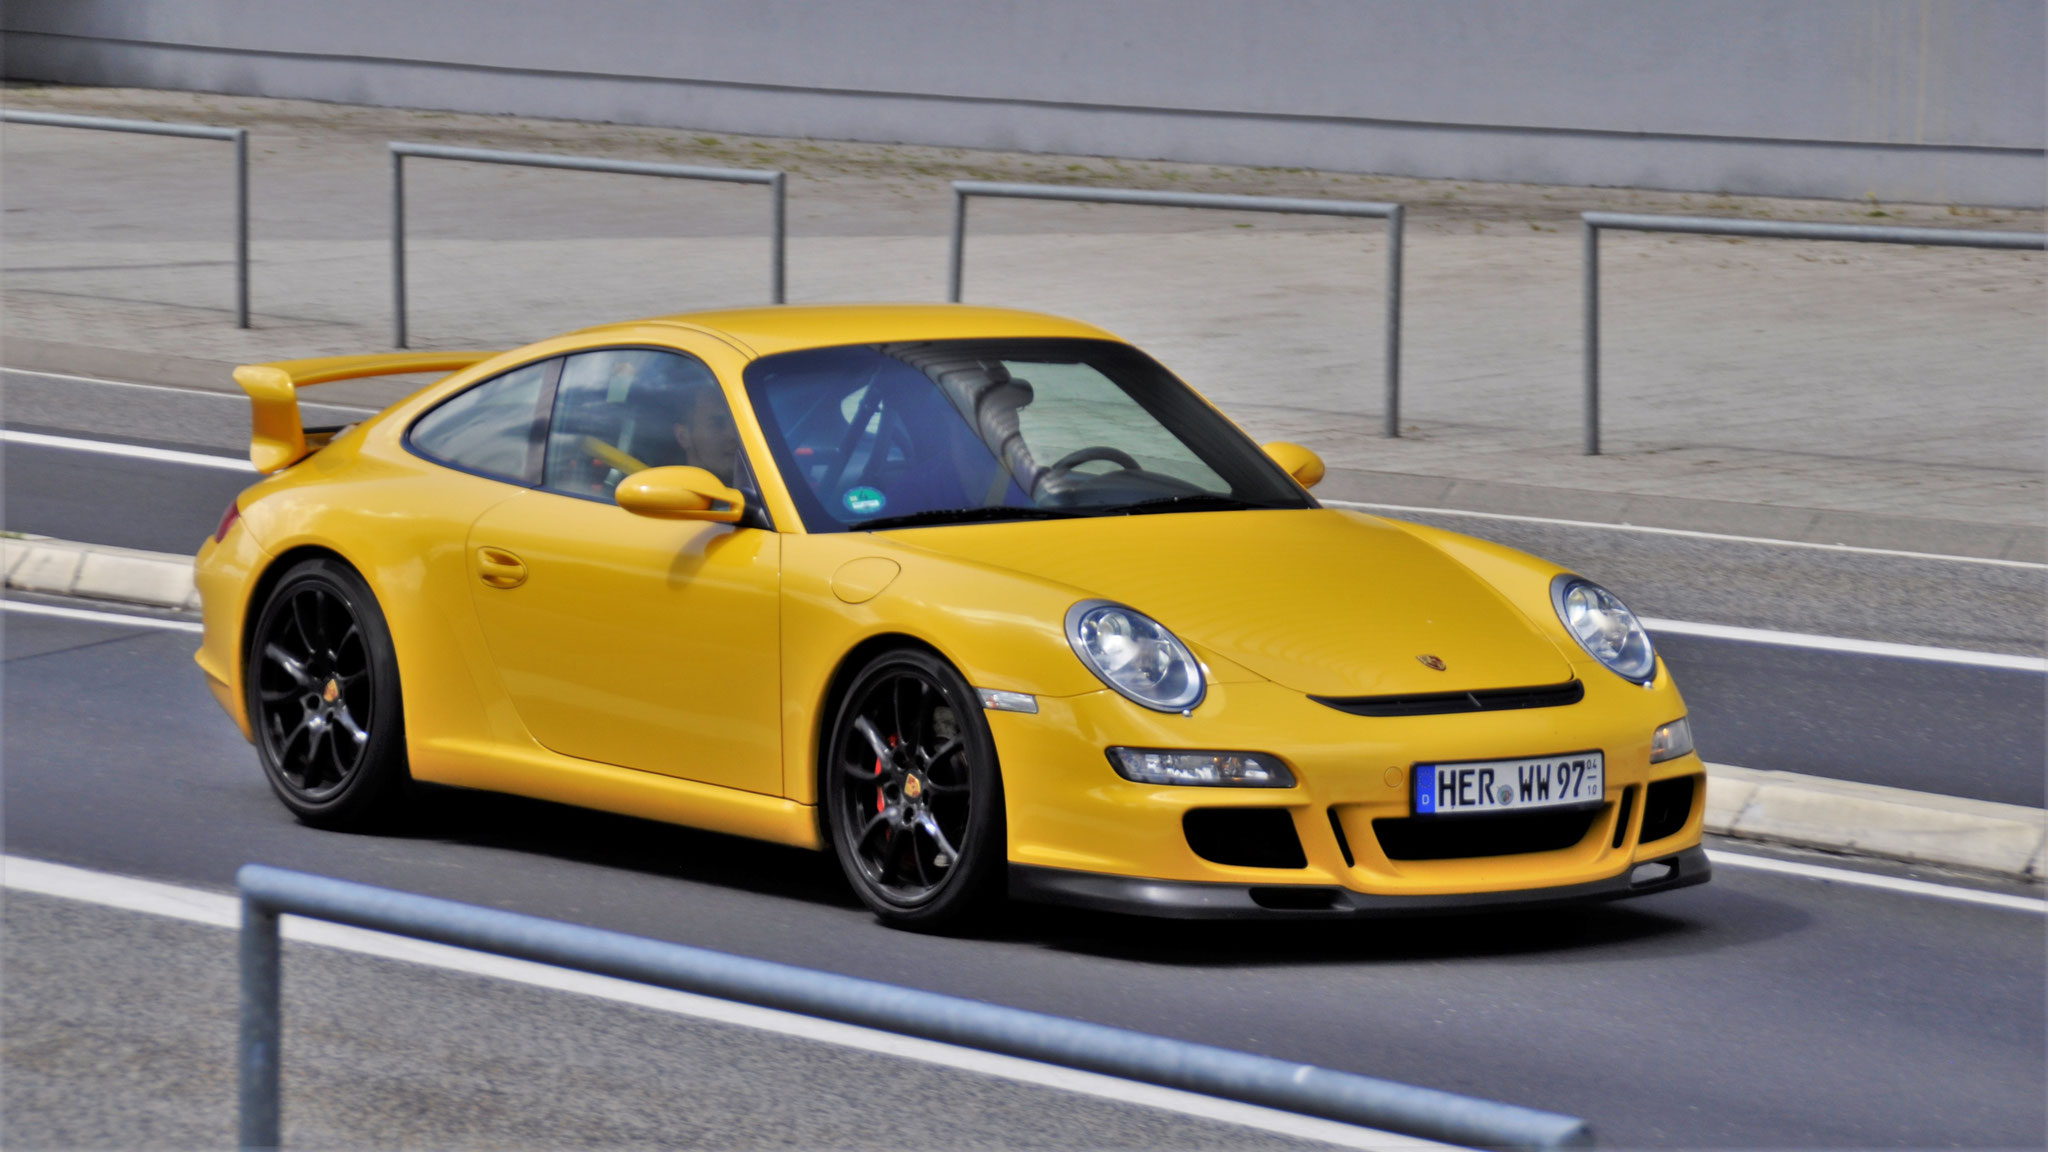 Porsche GT3 997 - HER-WW-97